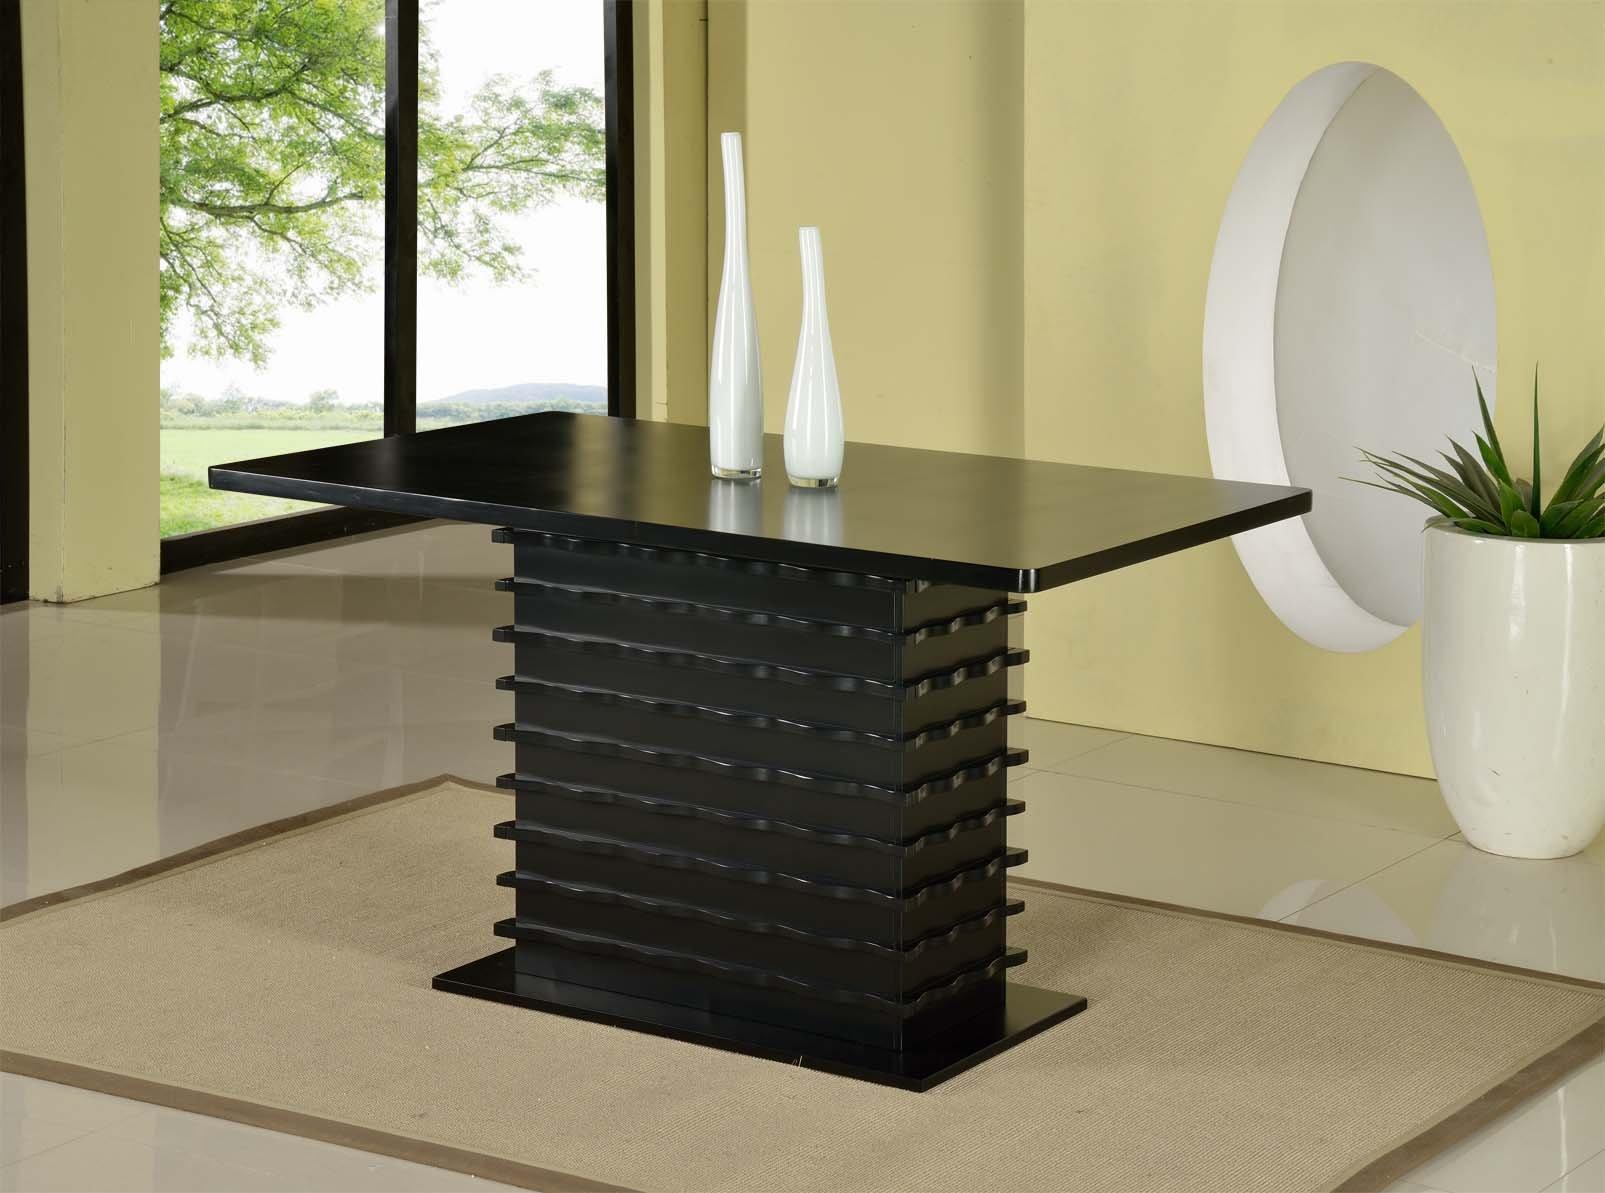 King's Brand Black Finish Wood Wave Design Dining Room Kitchen Table